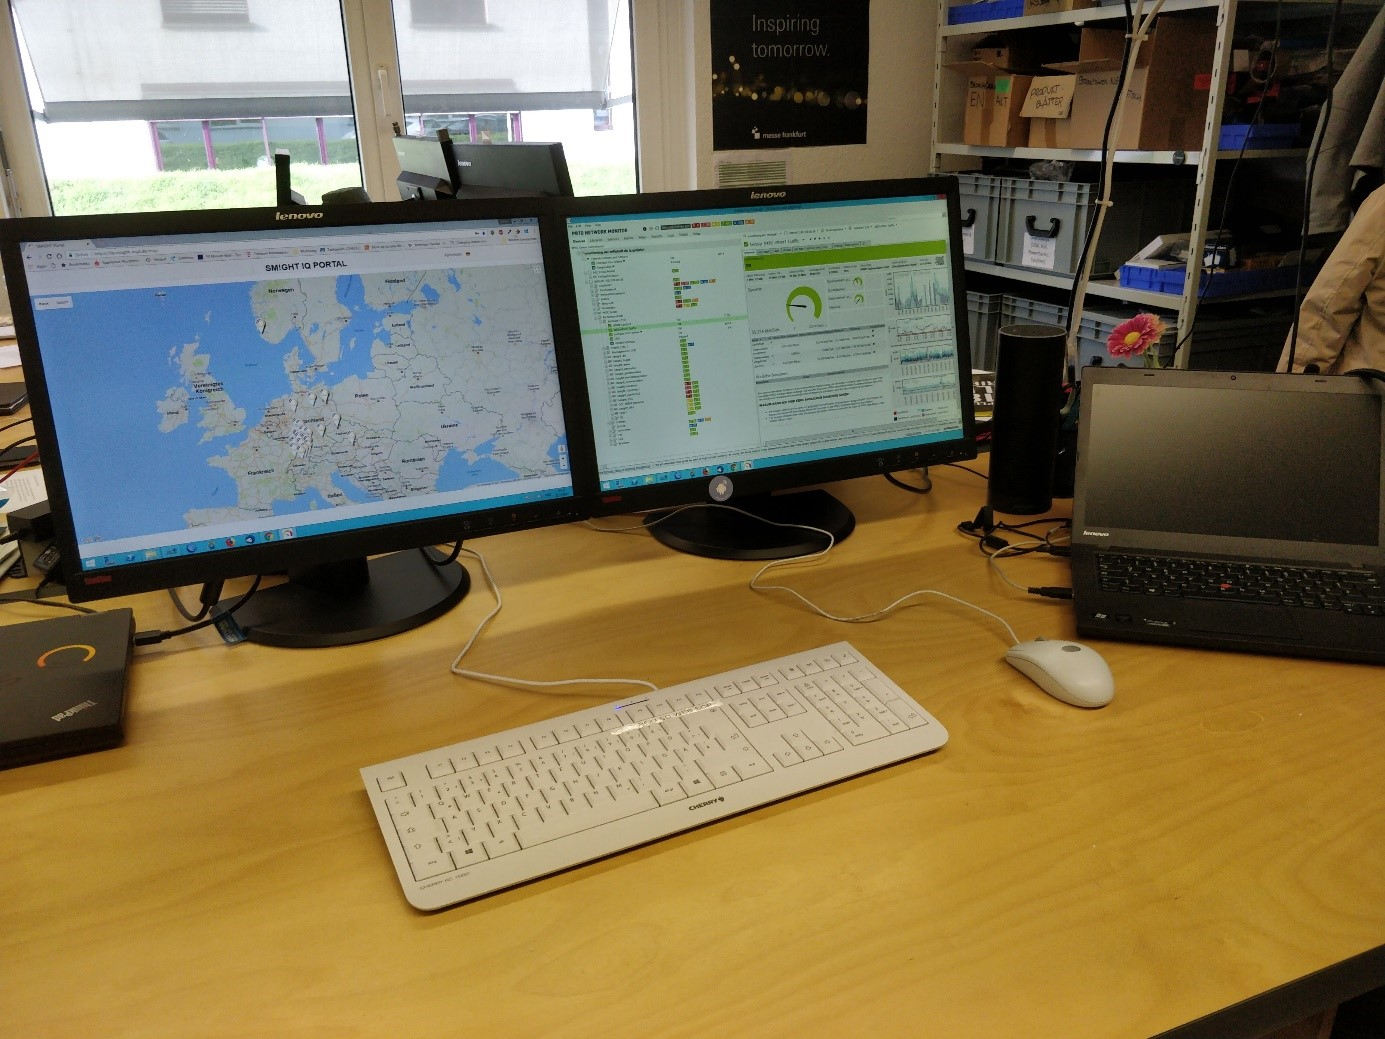 prtg-network-monitor-smght3.jpg